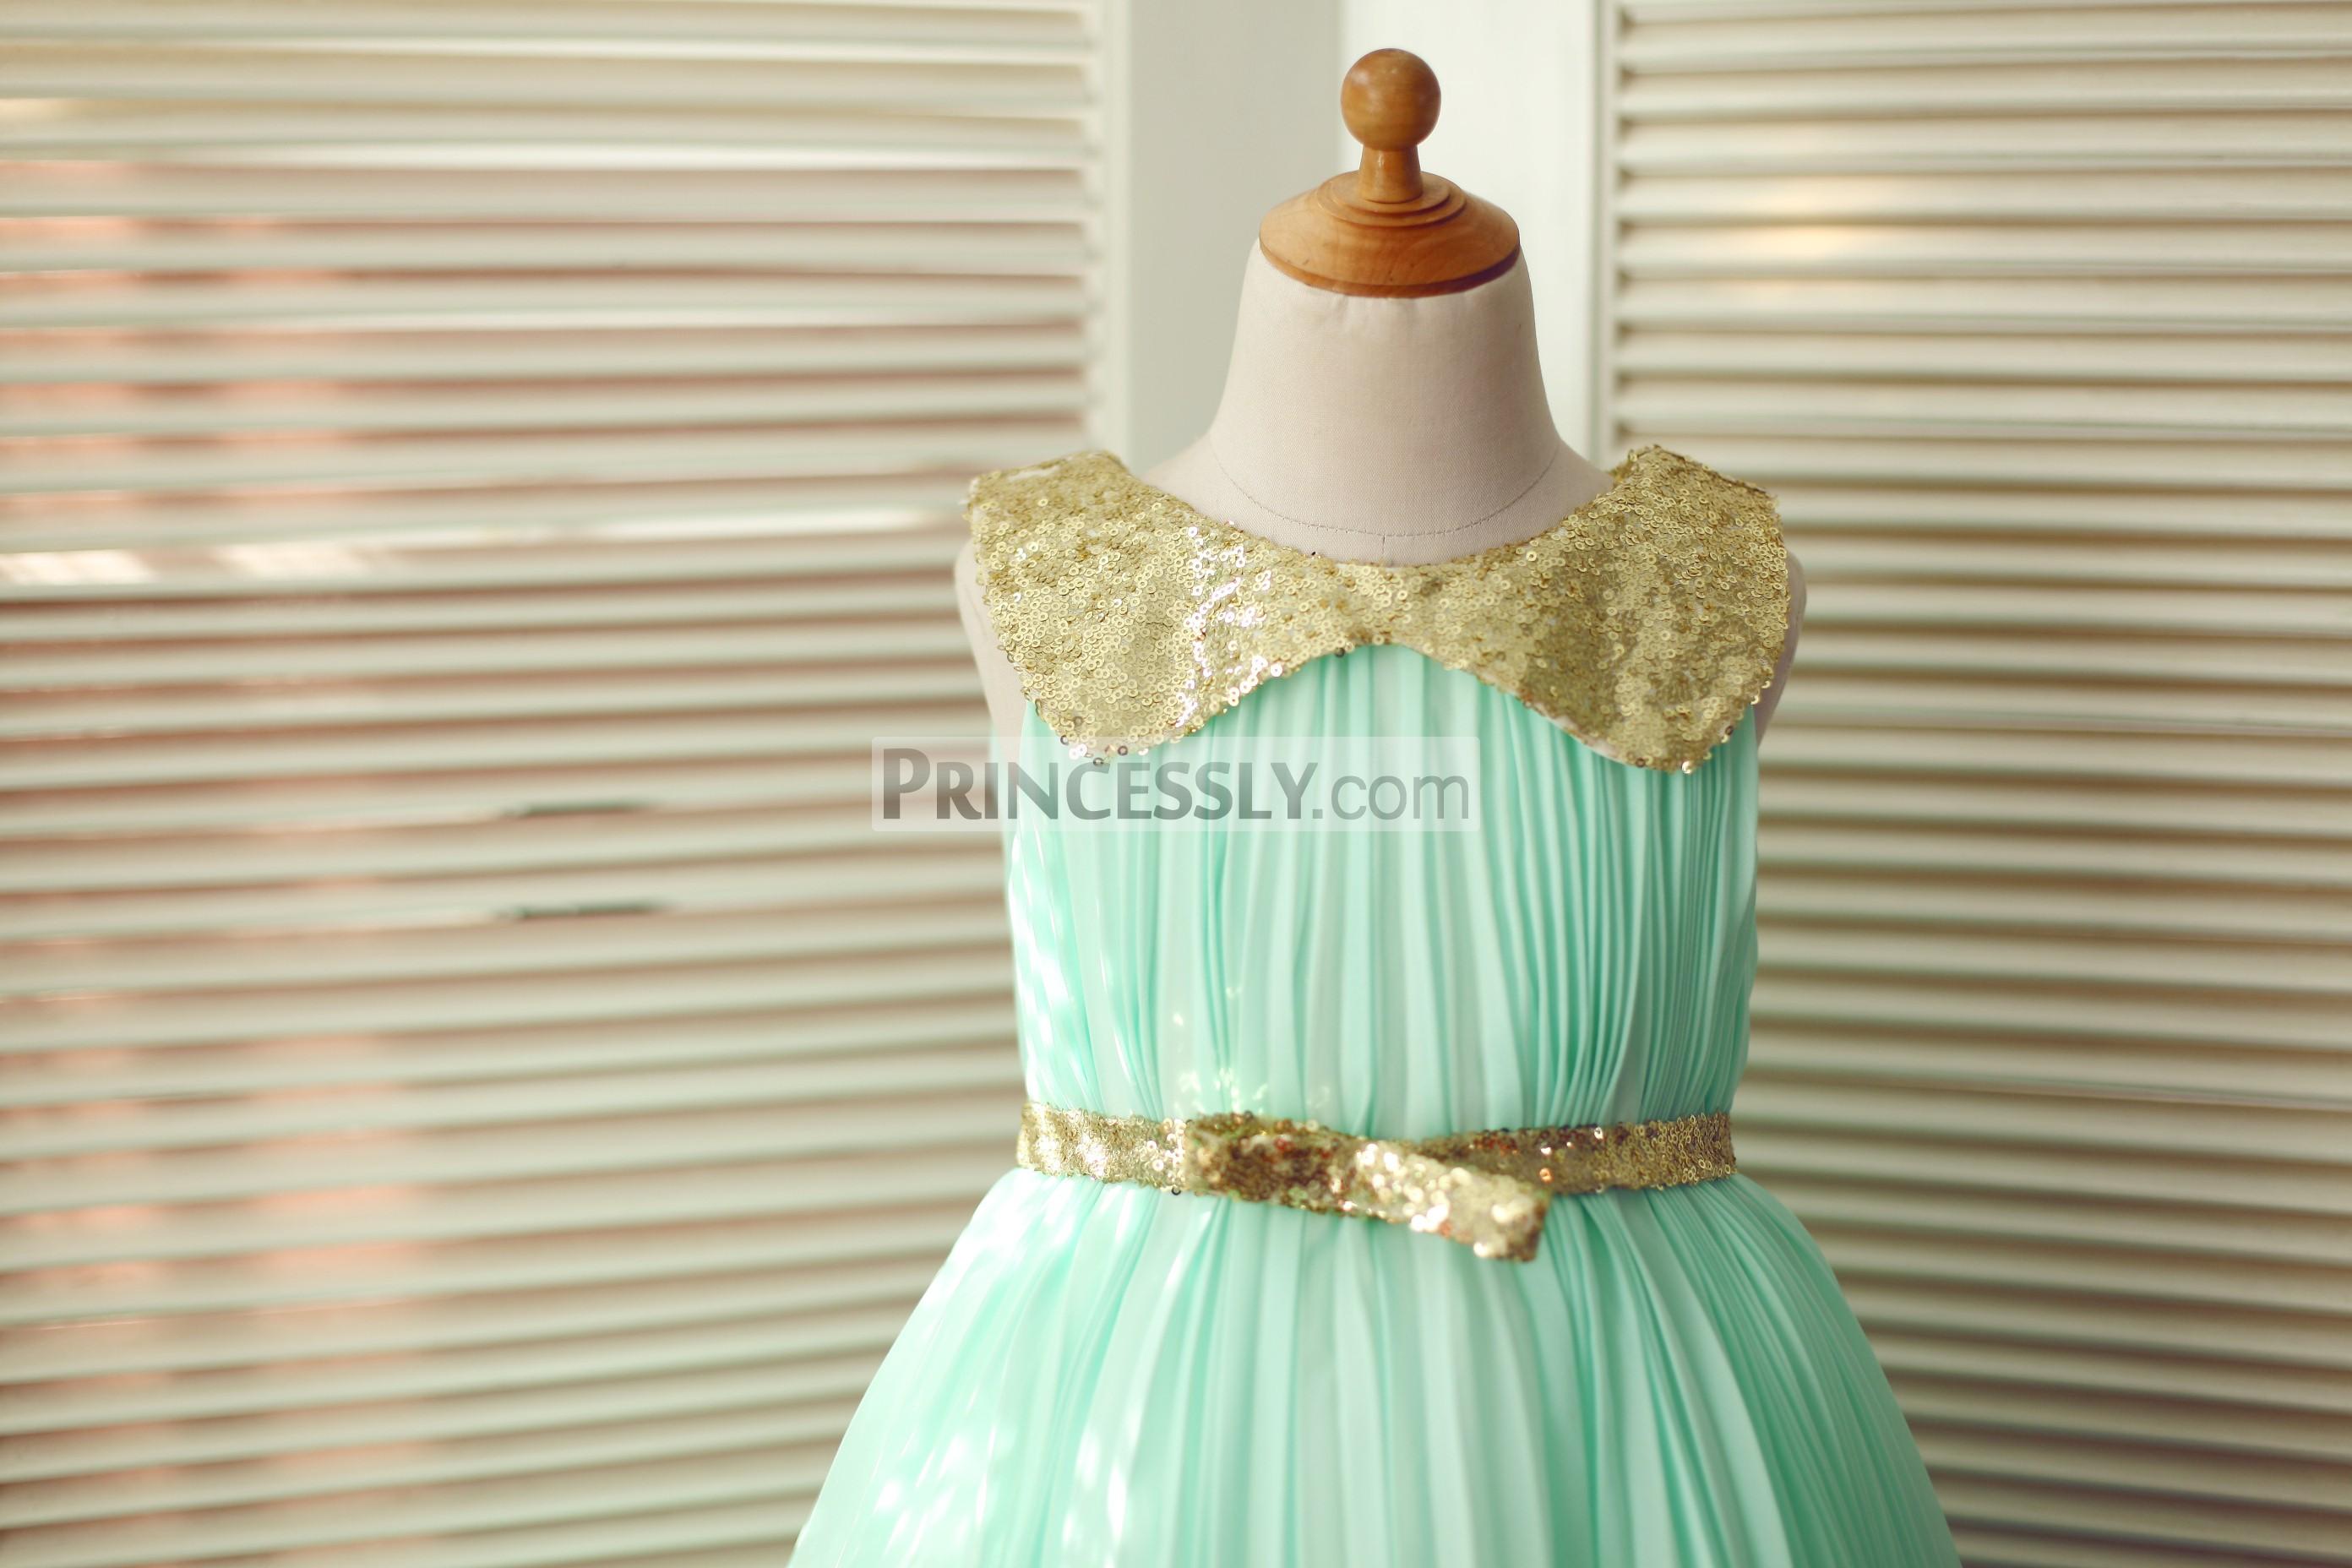 e3623d434e4 Mint green chiffon ivory tulle wedding baby girl dress. Gold sequin peter  pan collar and belt